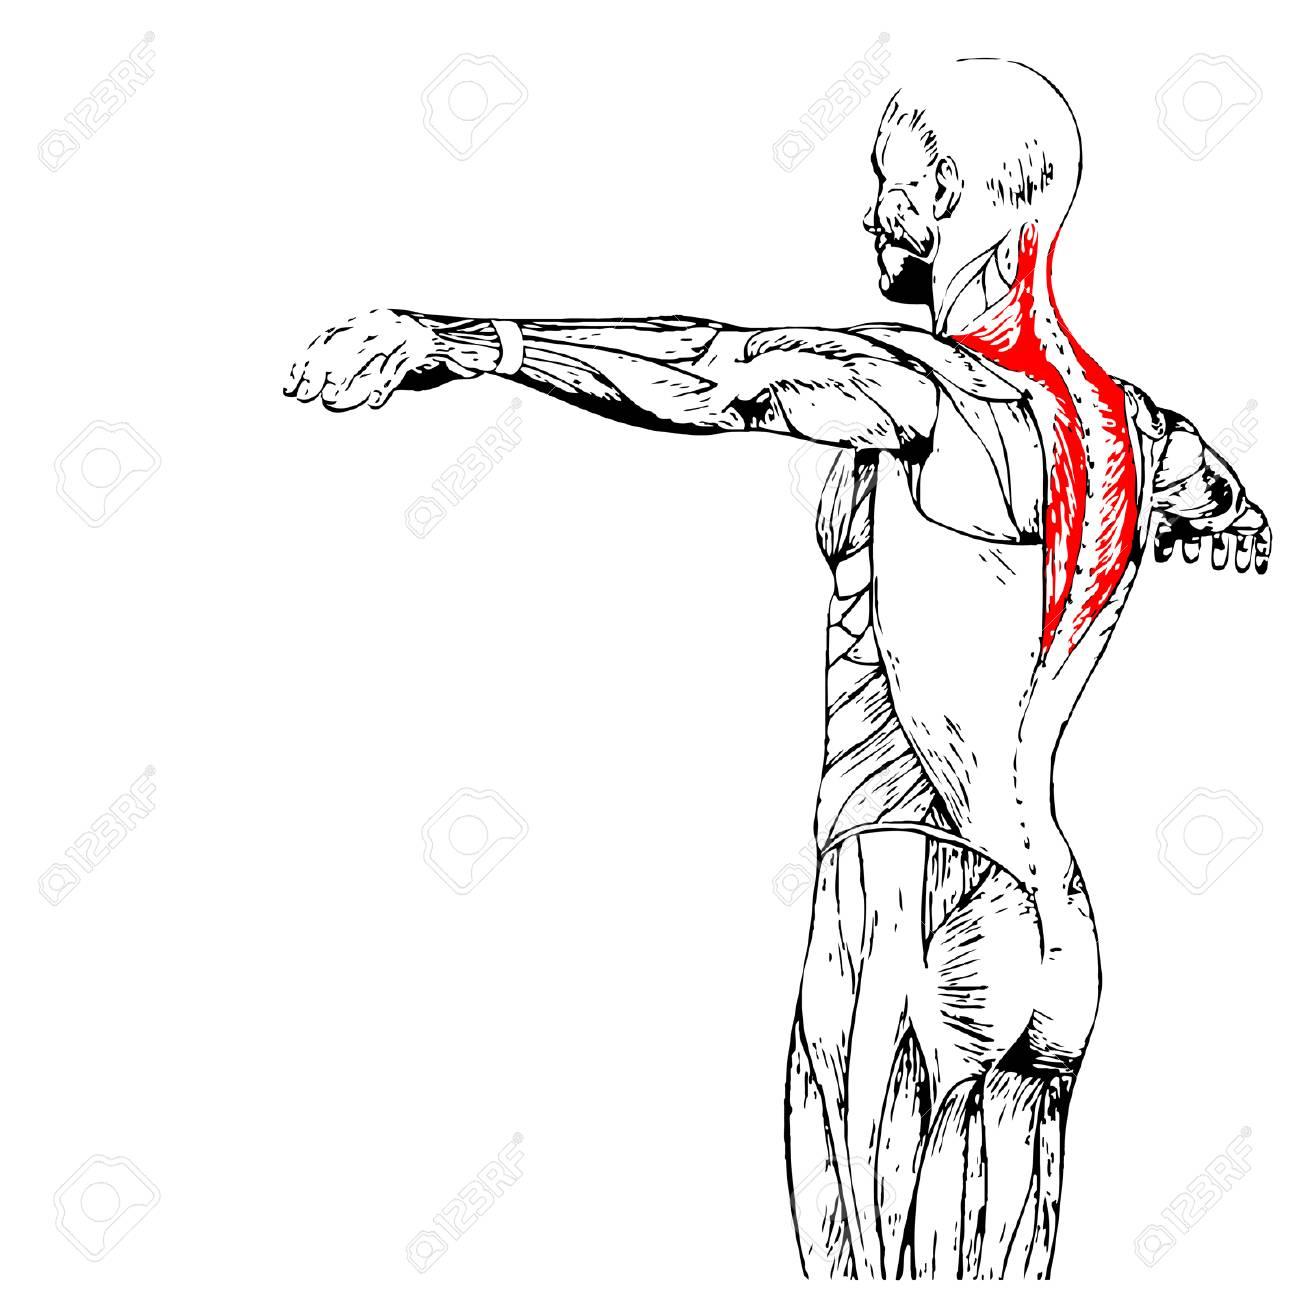 Vistoso Anatomía Back Humana Inspiración - Imágenes de Anatomía ...